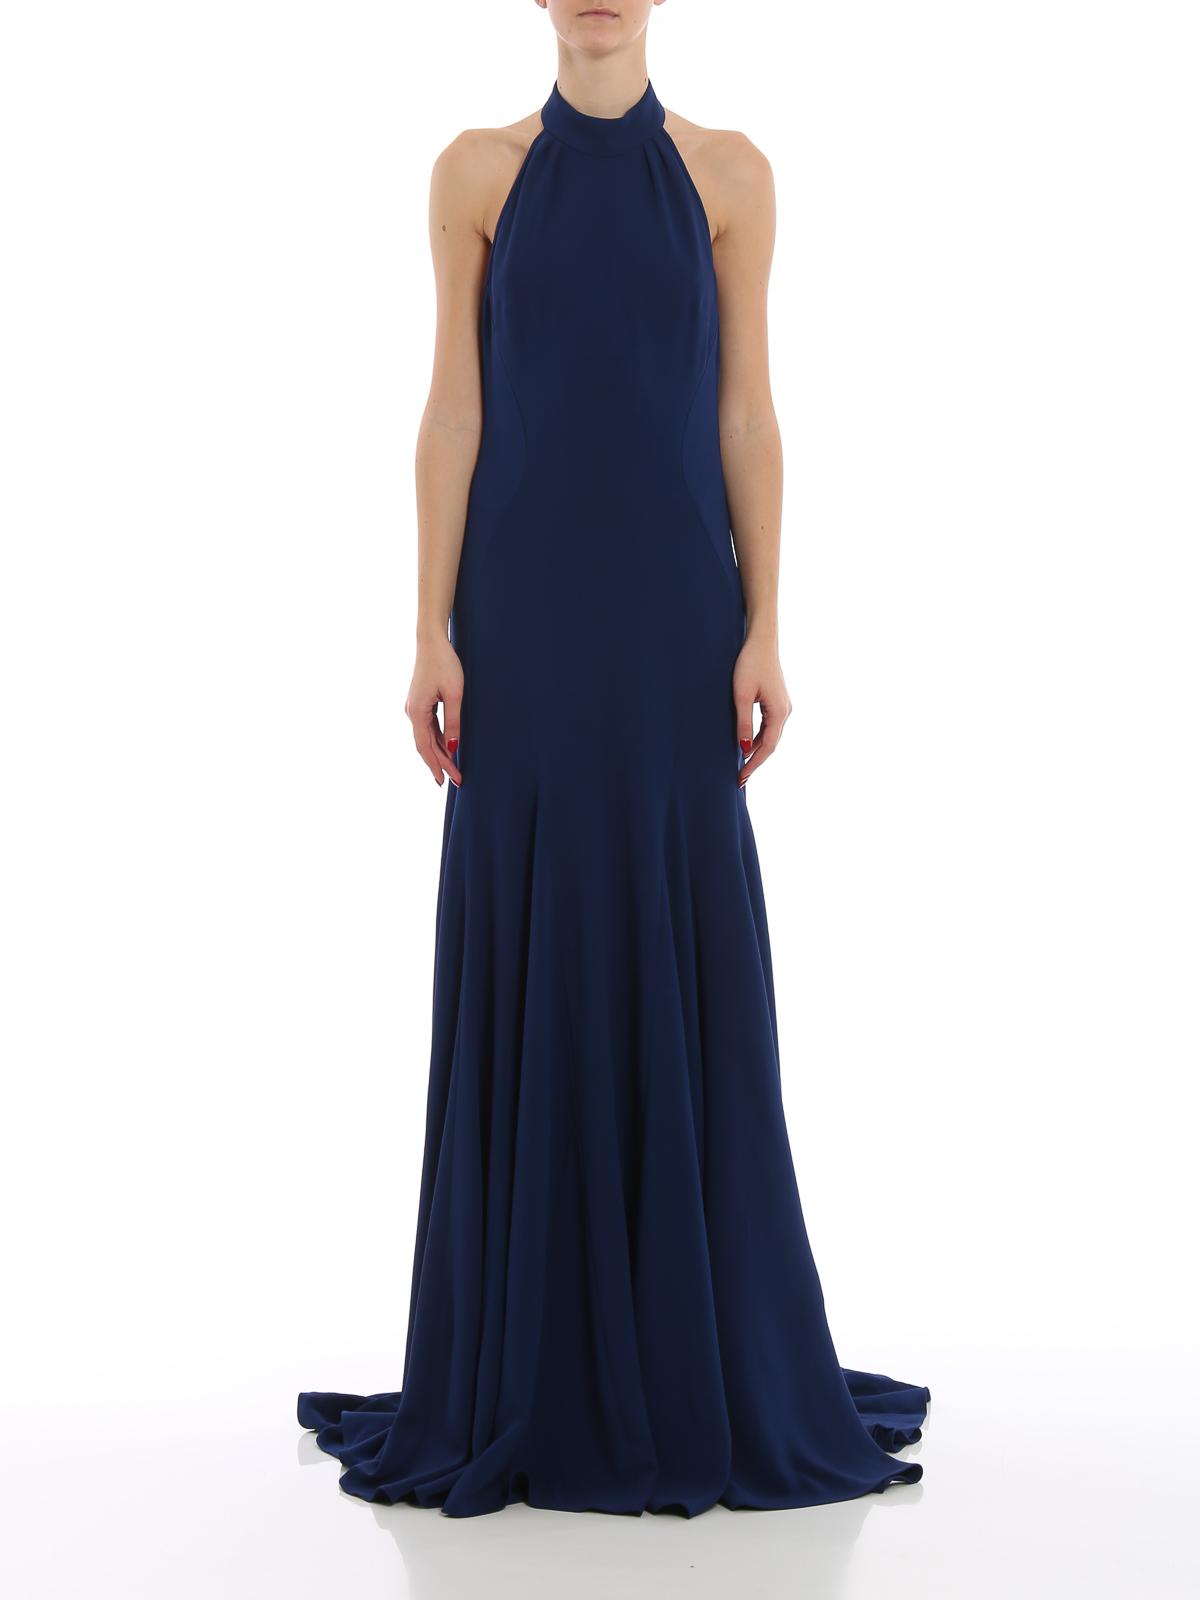 Stella Mccartney - Abendkleid - Dunkelblau - Abendkleider